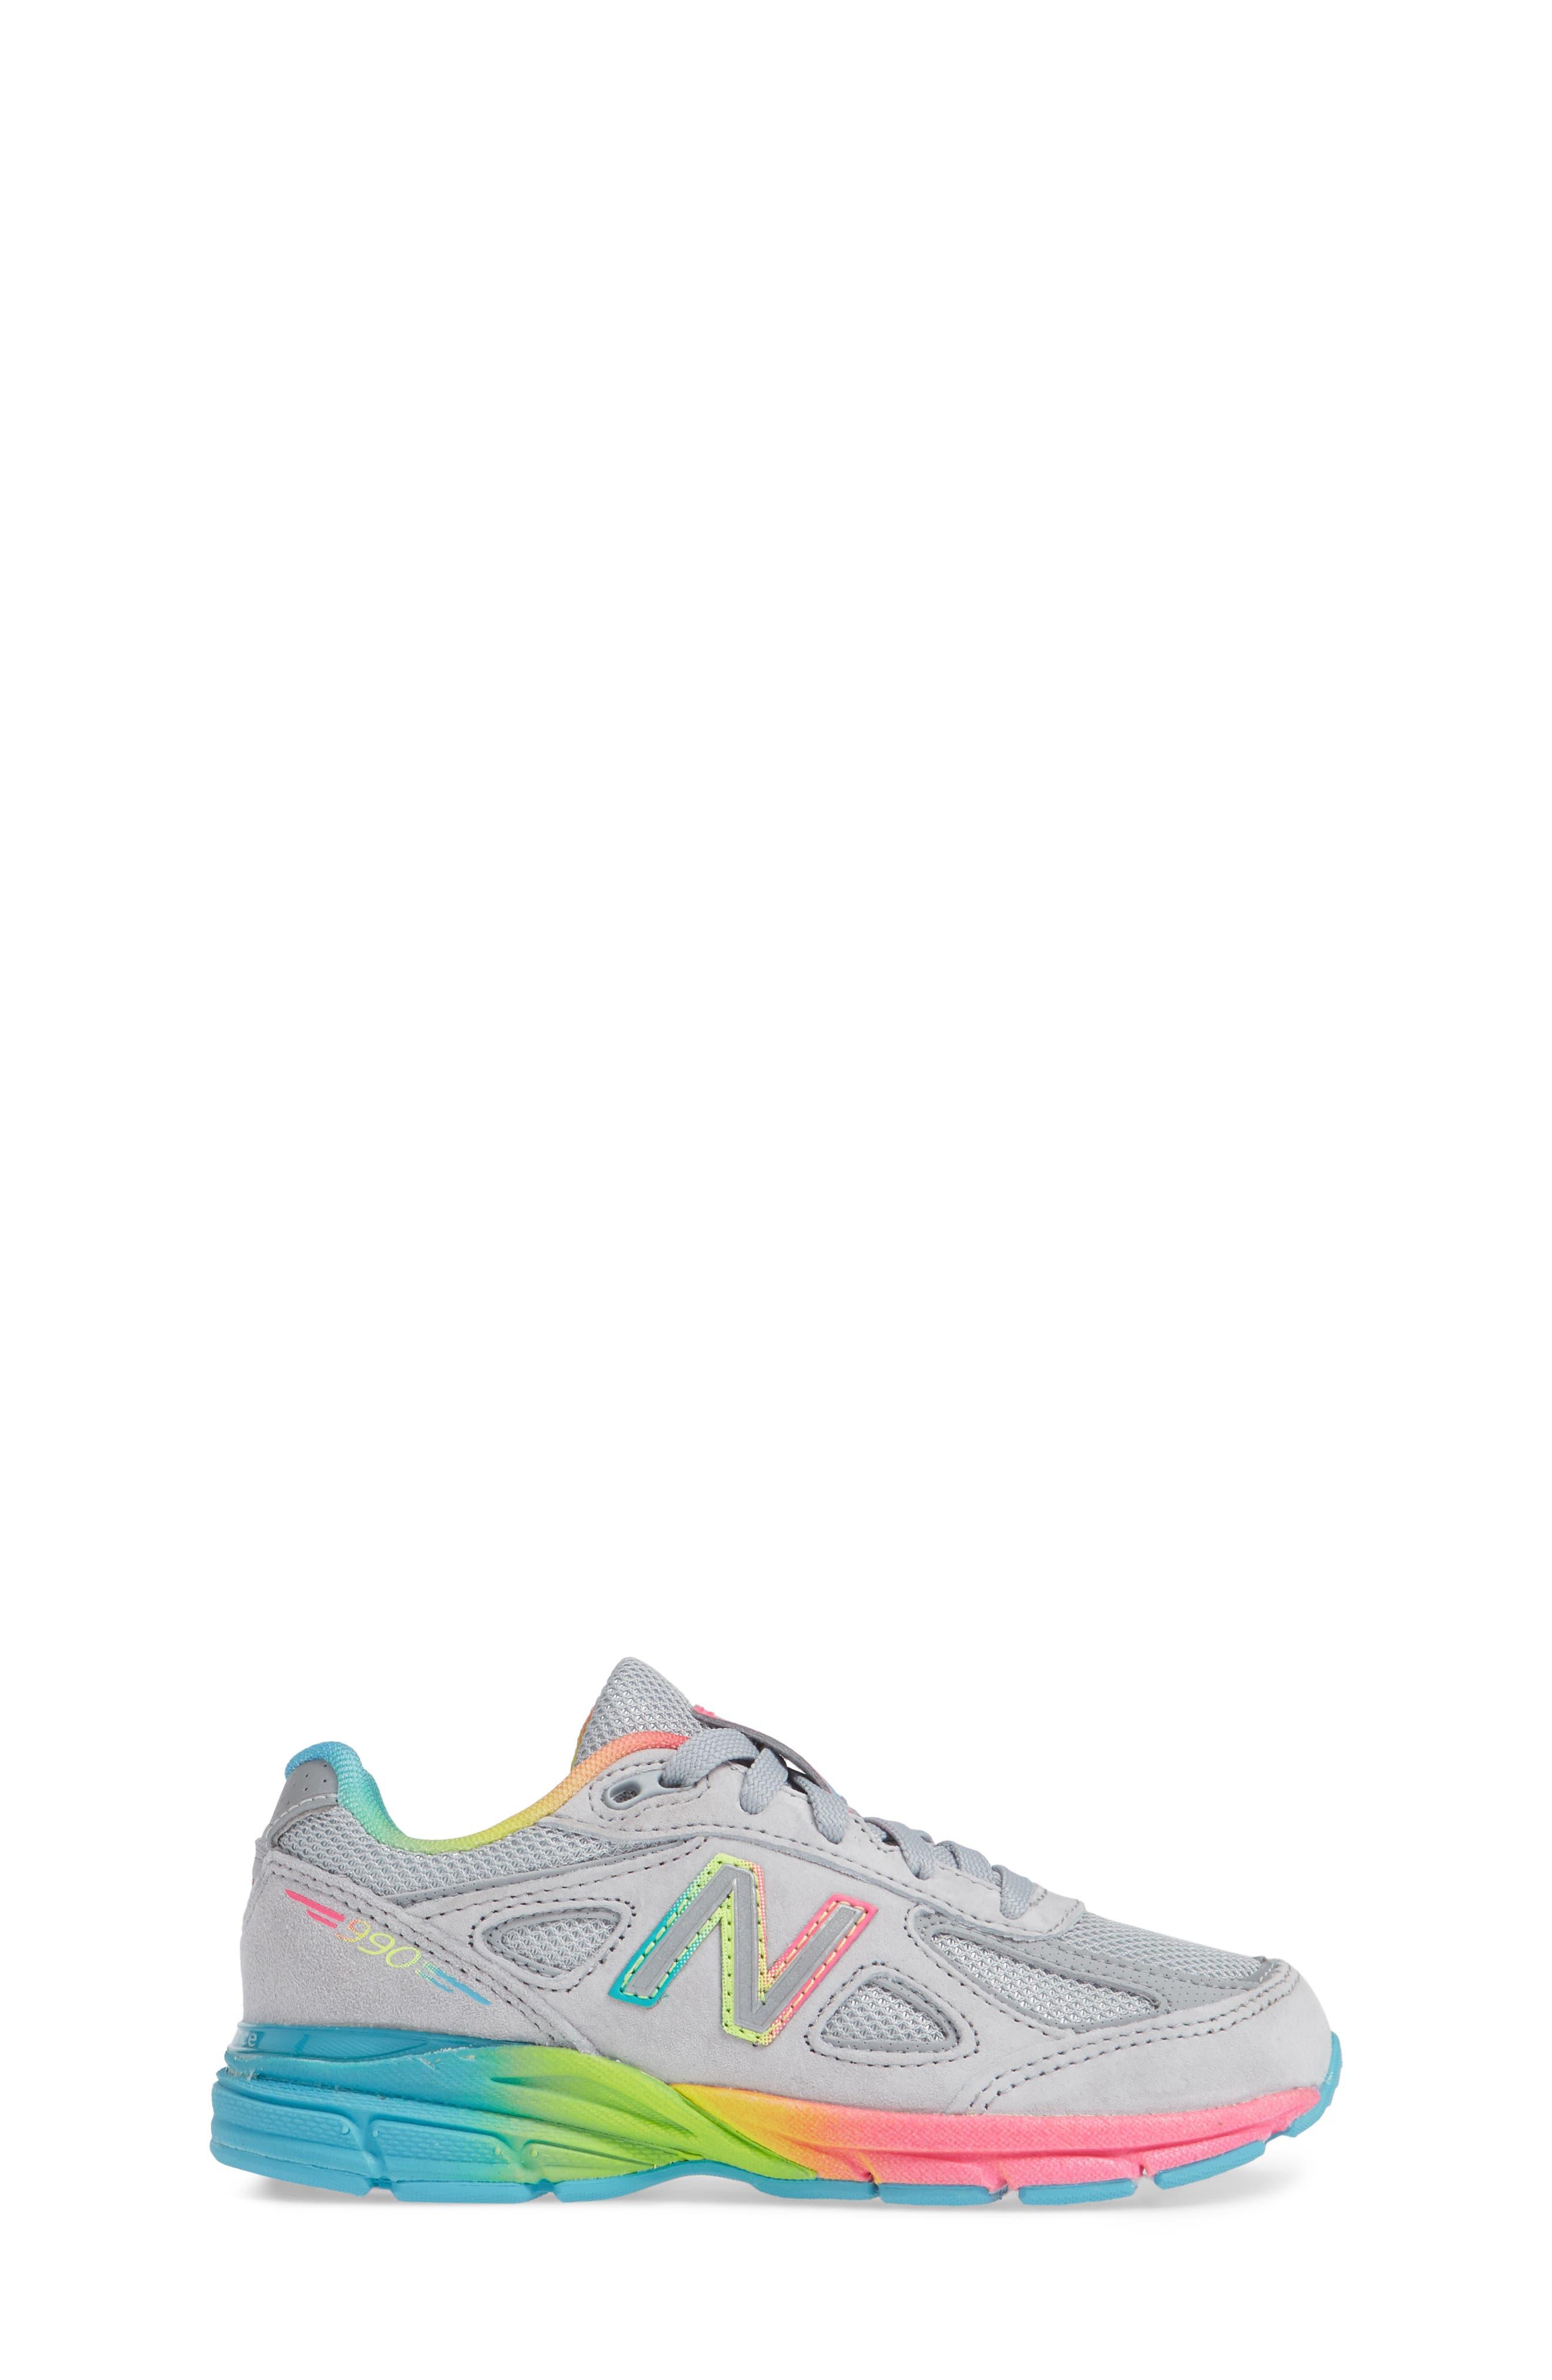 990v4 Sneaker,                             Alternate thumbnail 3, color,                             ATHLETIC GREY/ MULTI